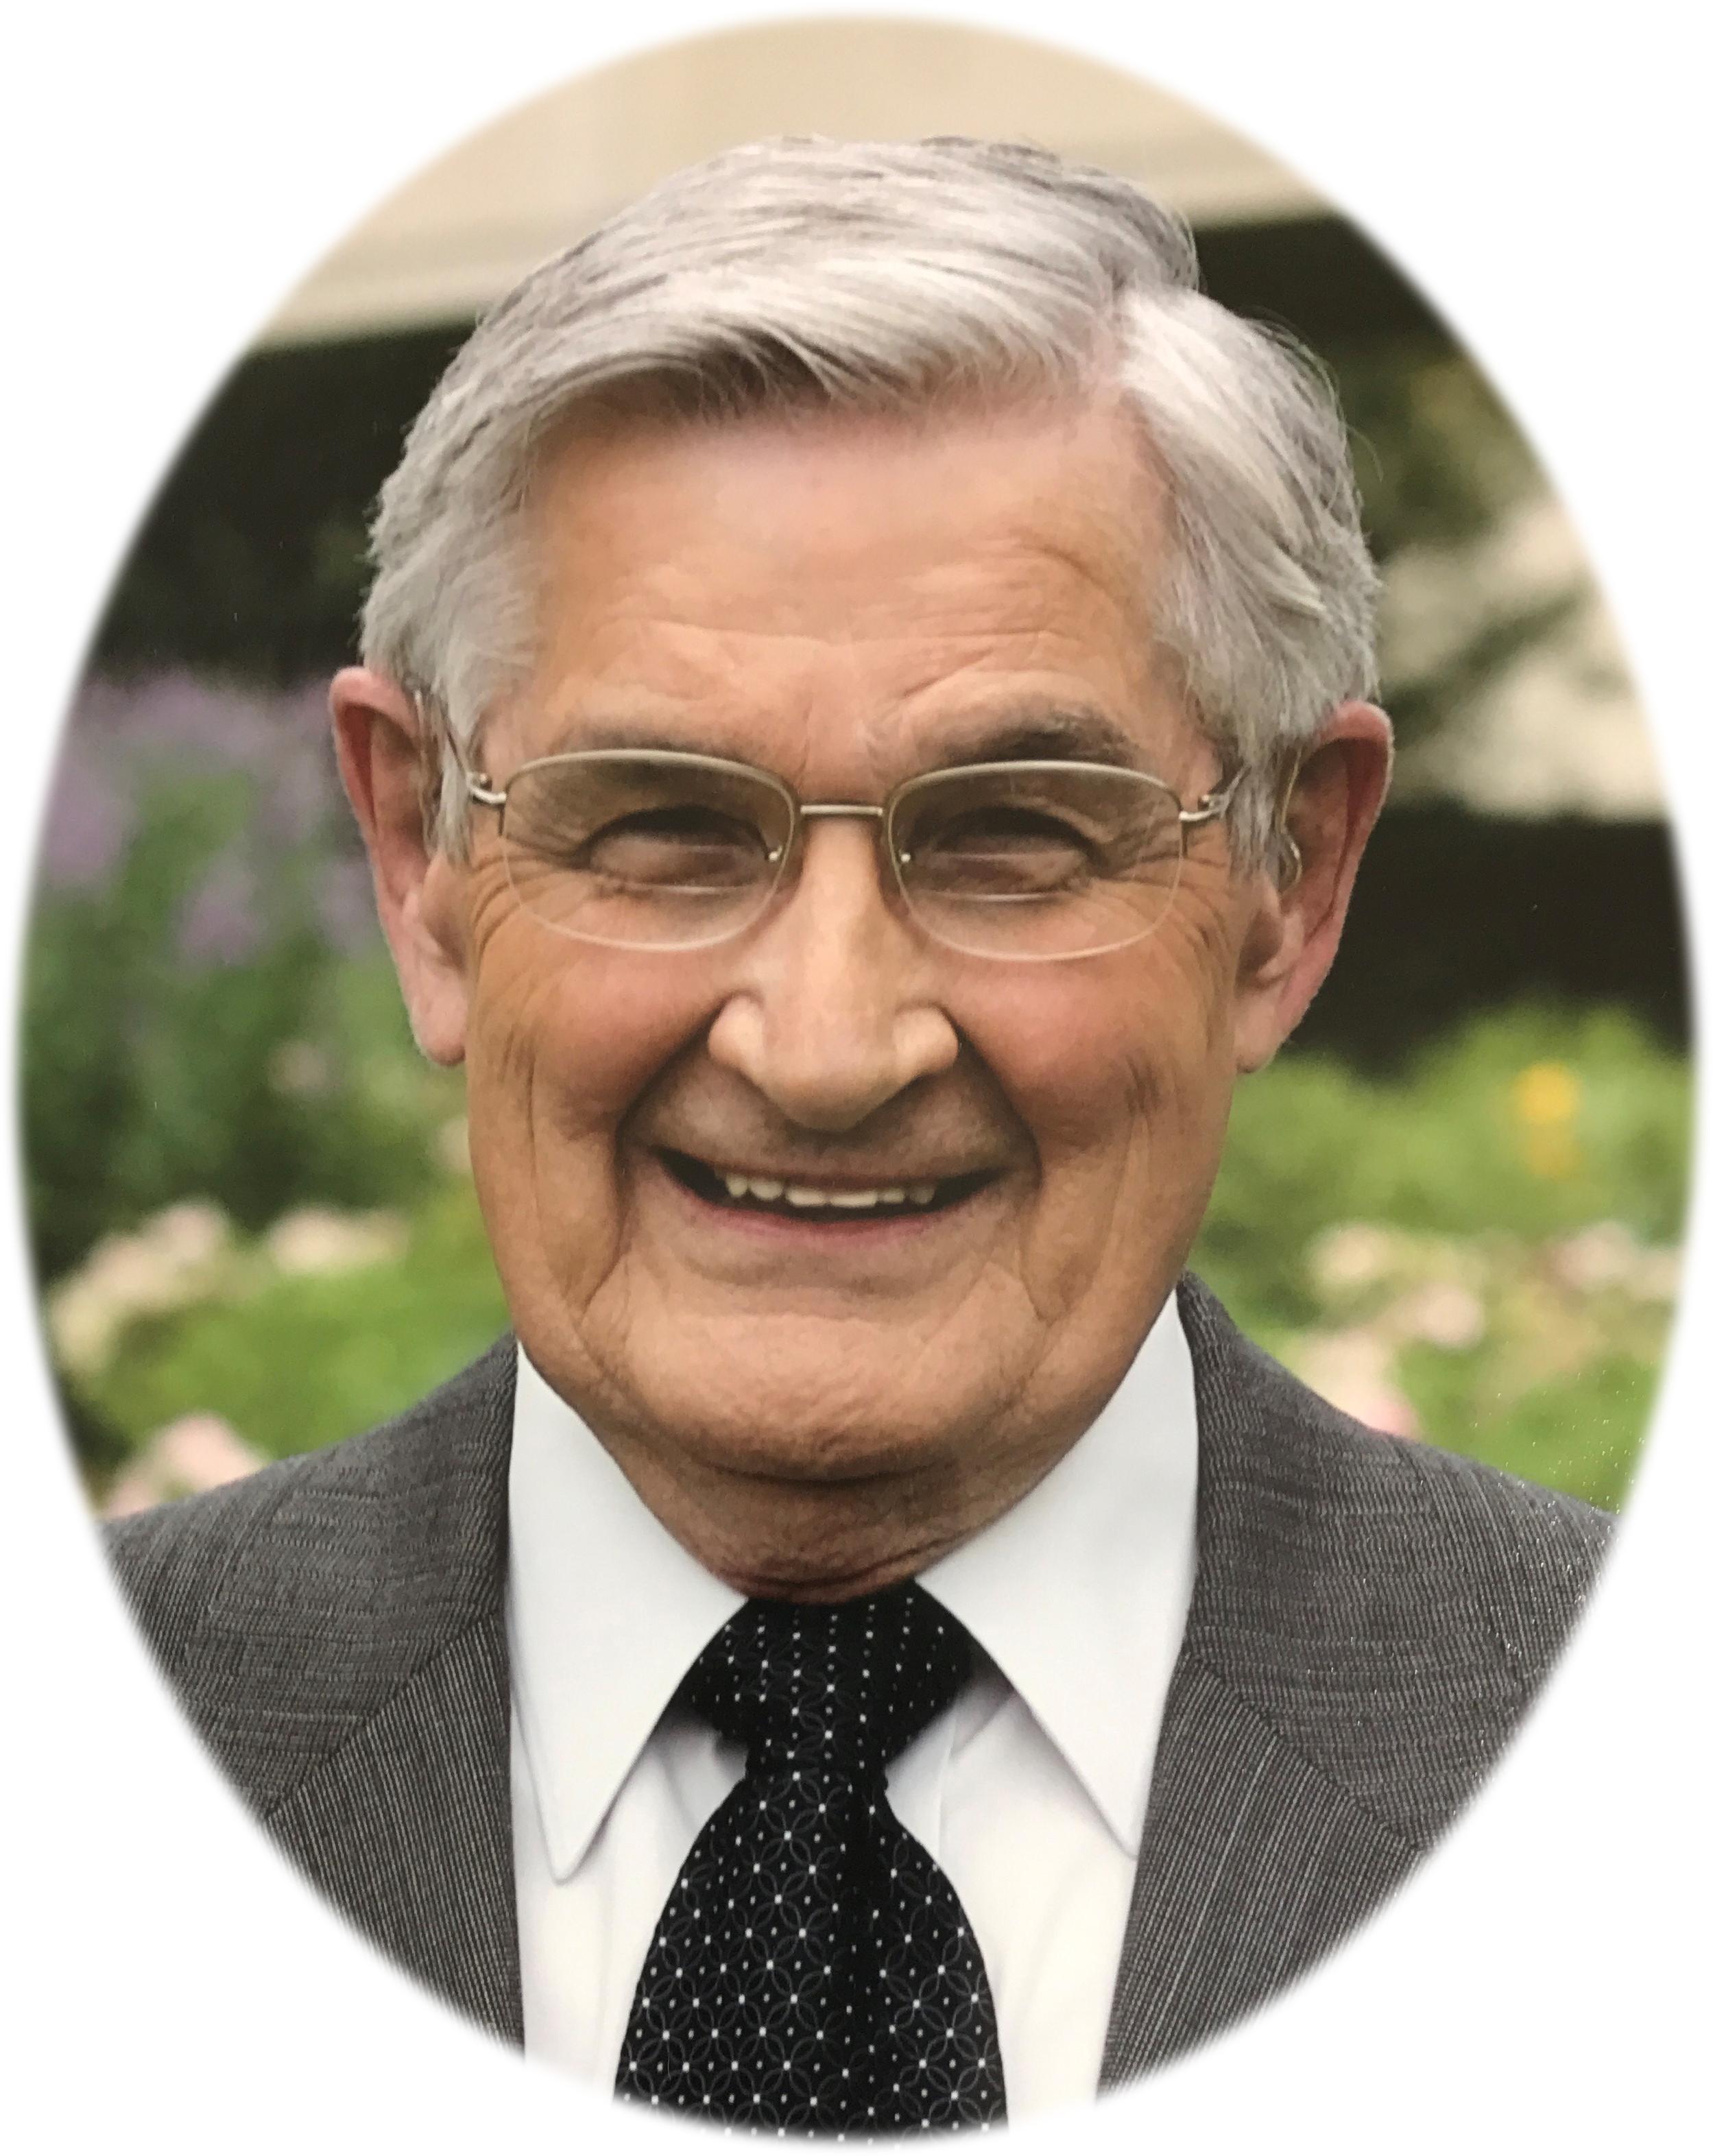 Donald P. Skoog, M.D.